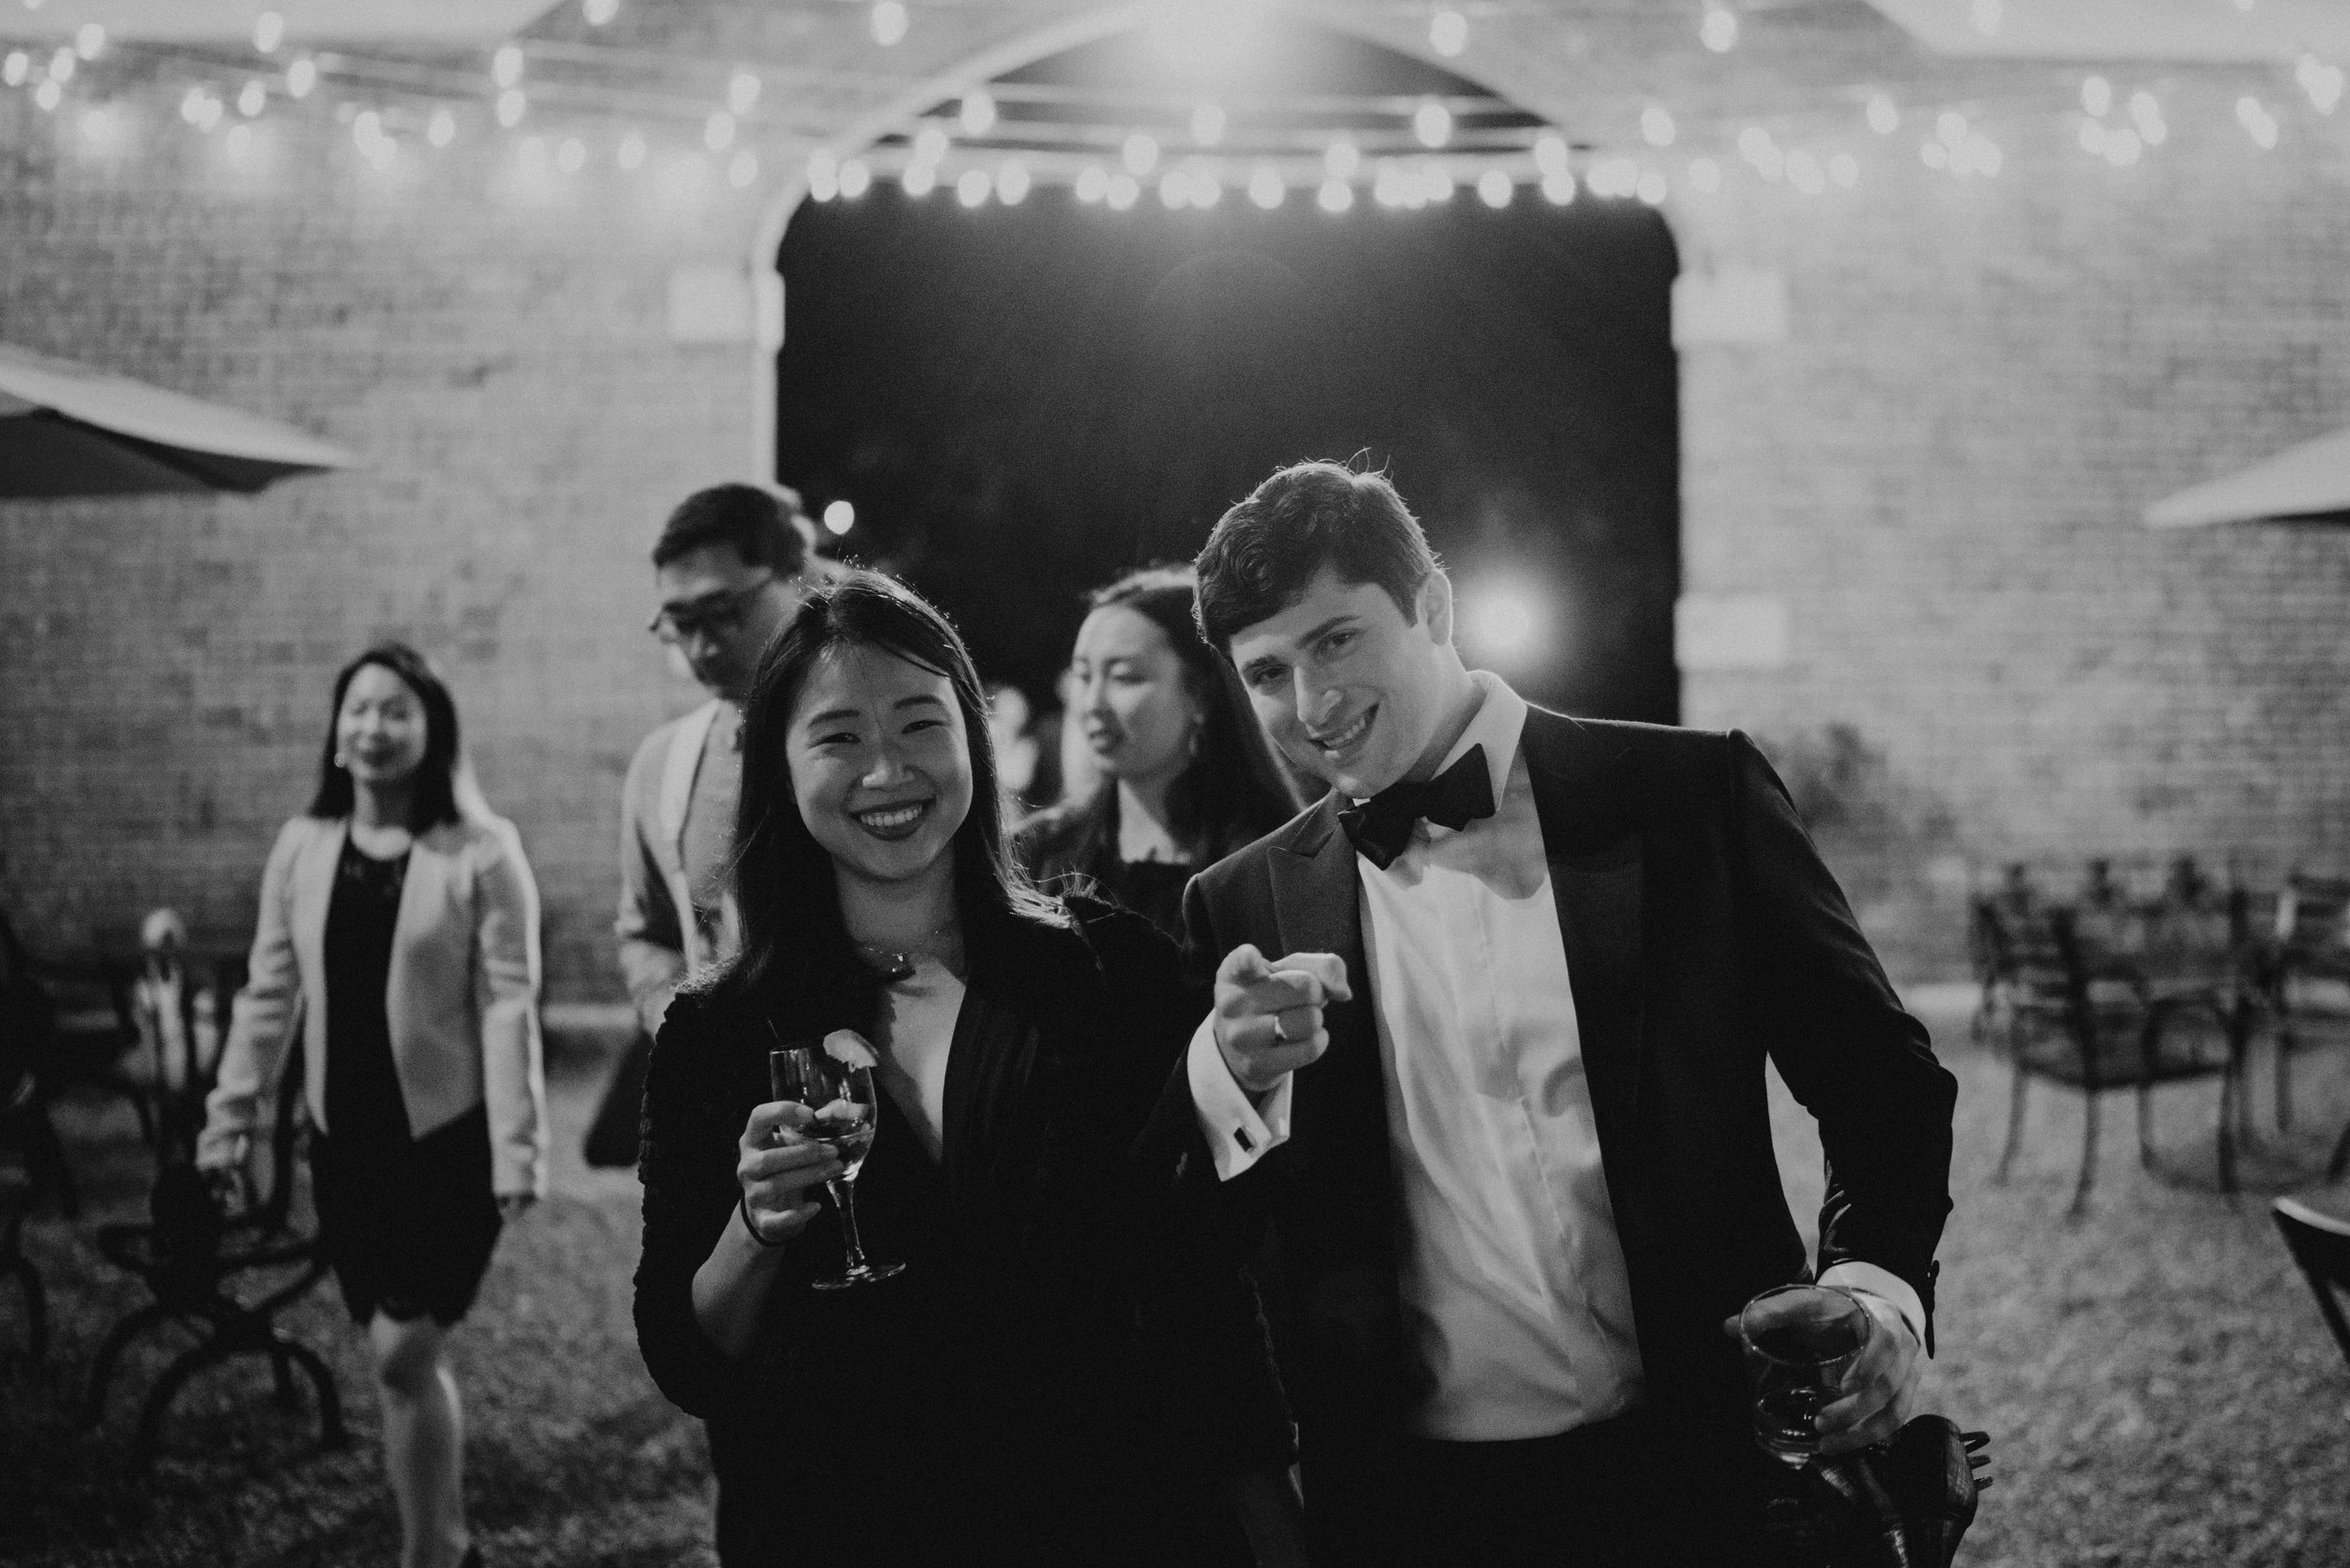 Irene-and-Jae-2019_Brooklyn_Wedding_Photographer_Chellise_Michael_Photography--93.jpg